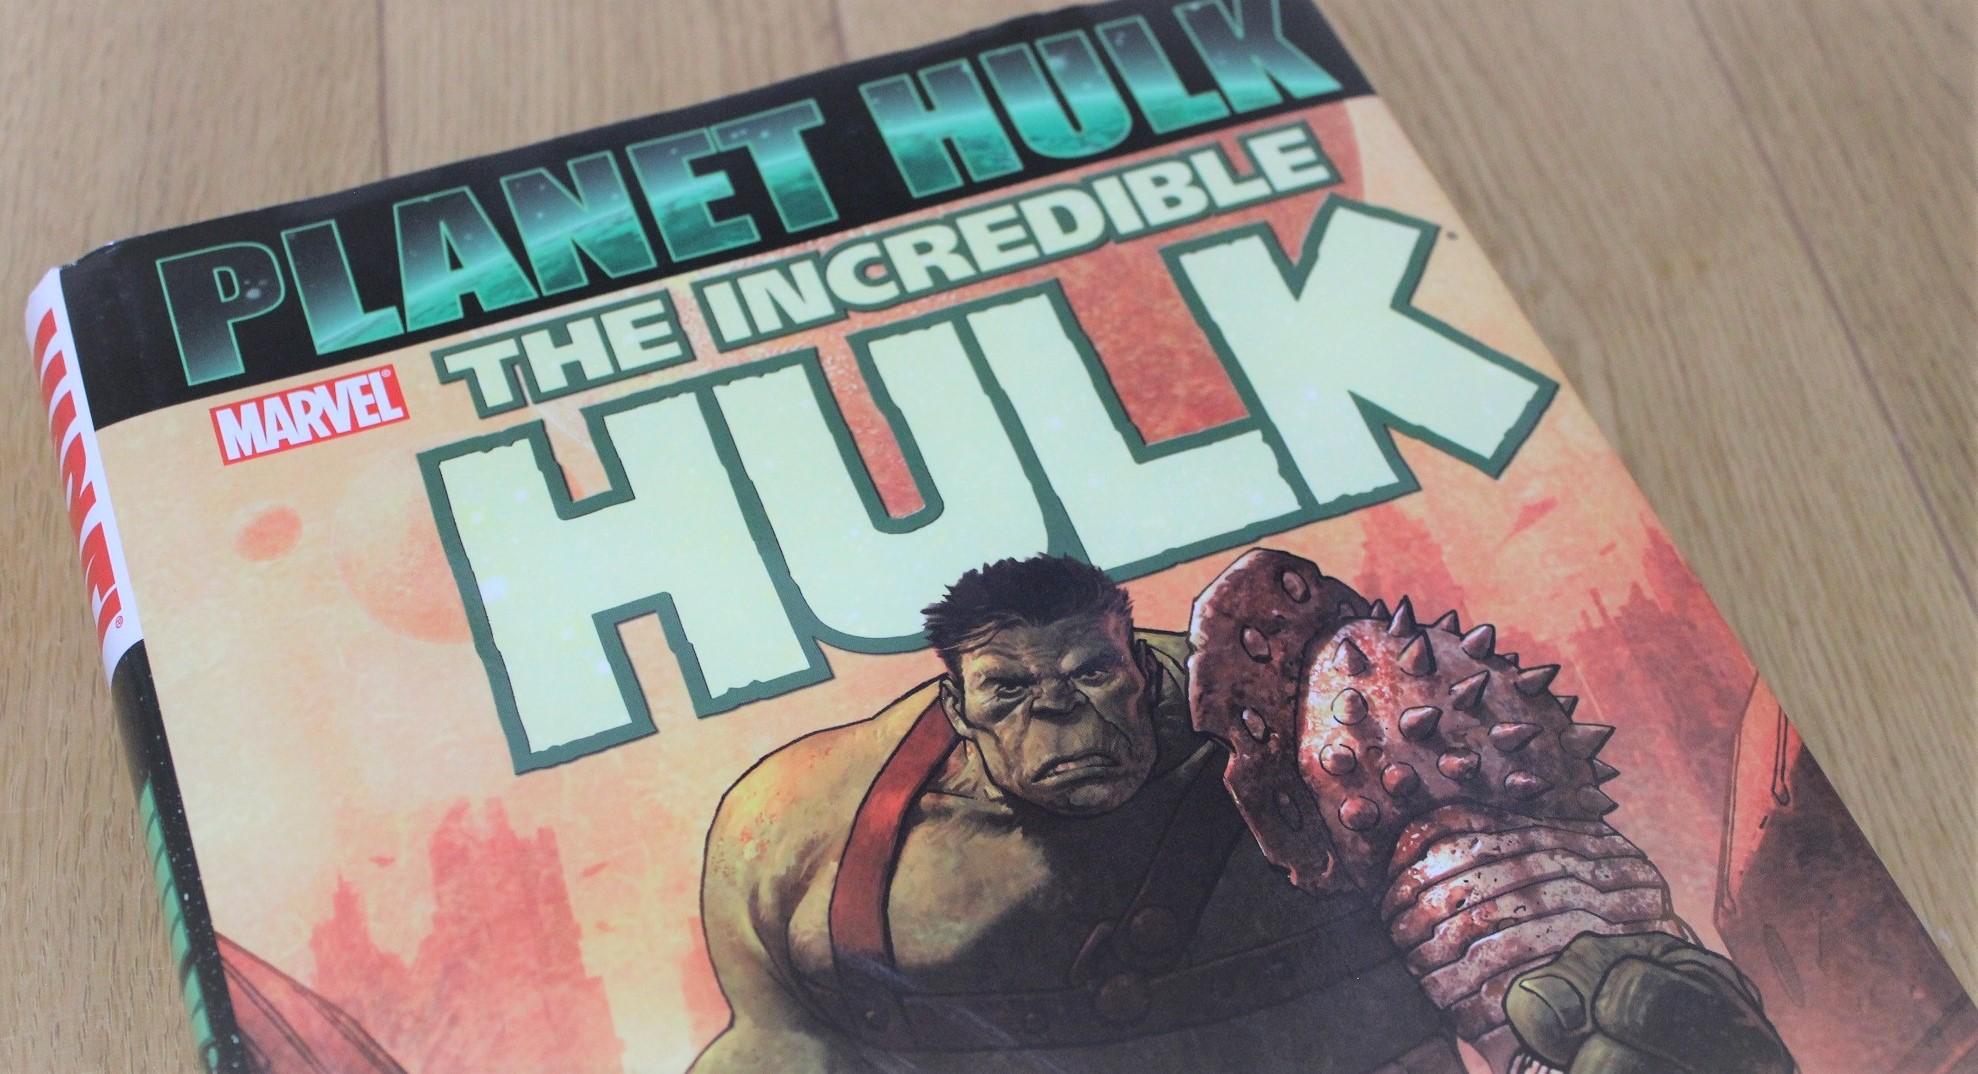 Otafu Susume 07 - It's Like Thor Ragnarok...But NOT (Planet Hulk)